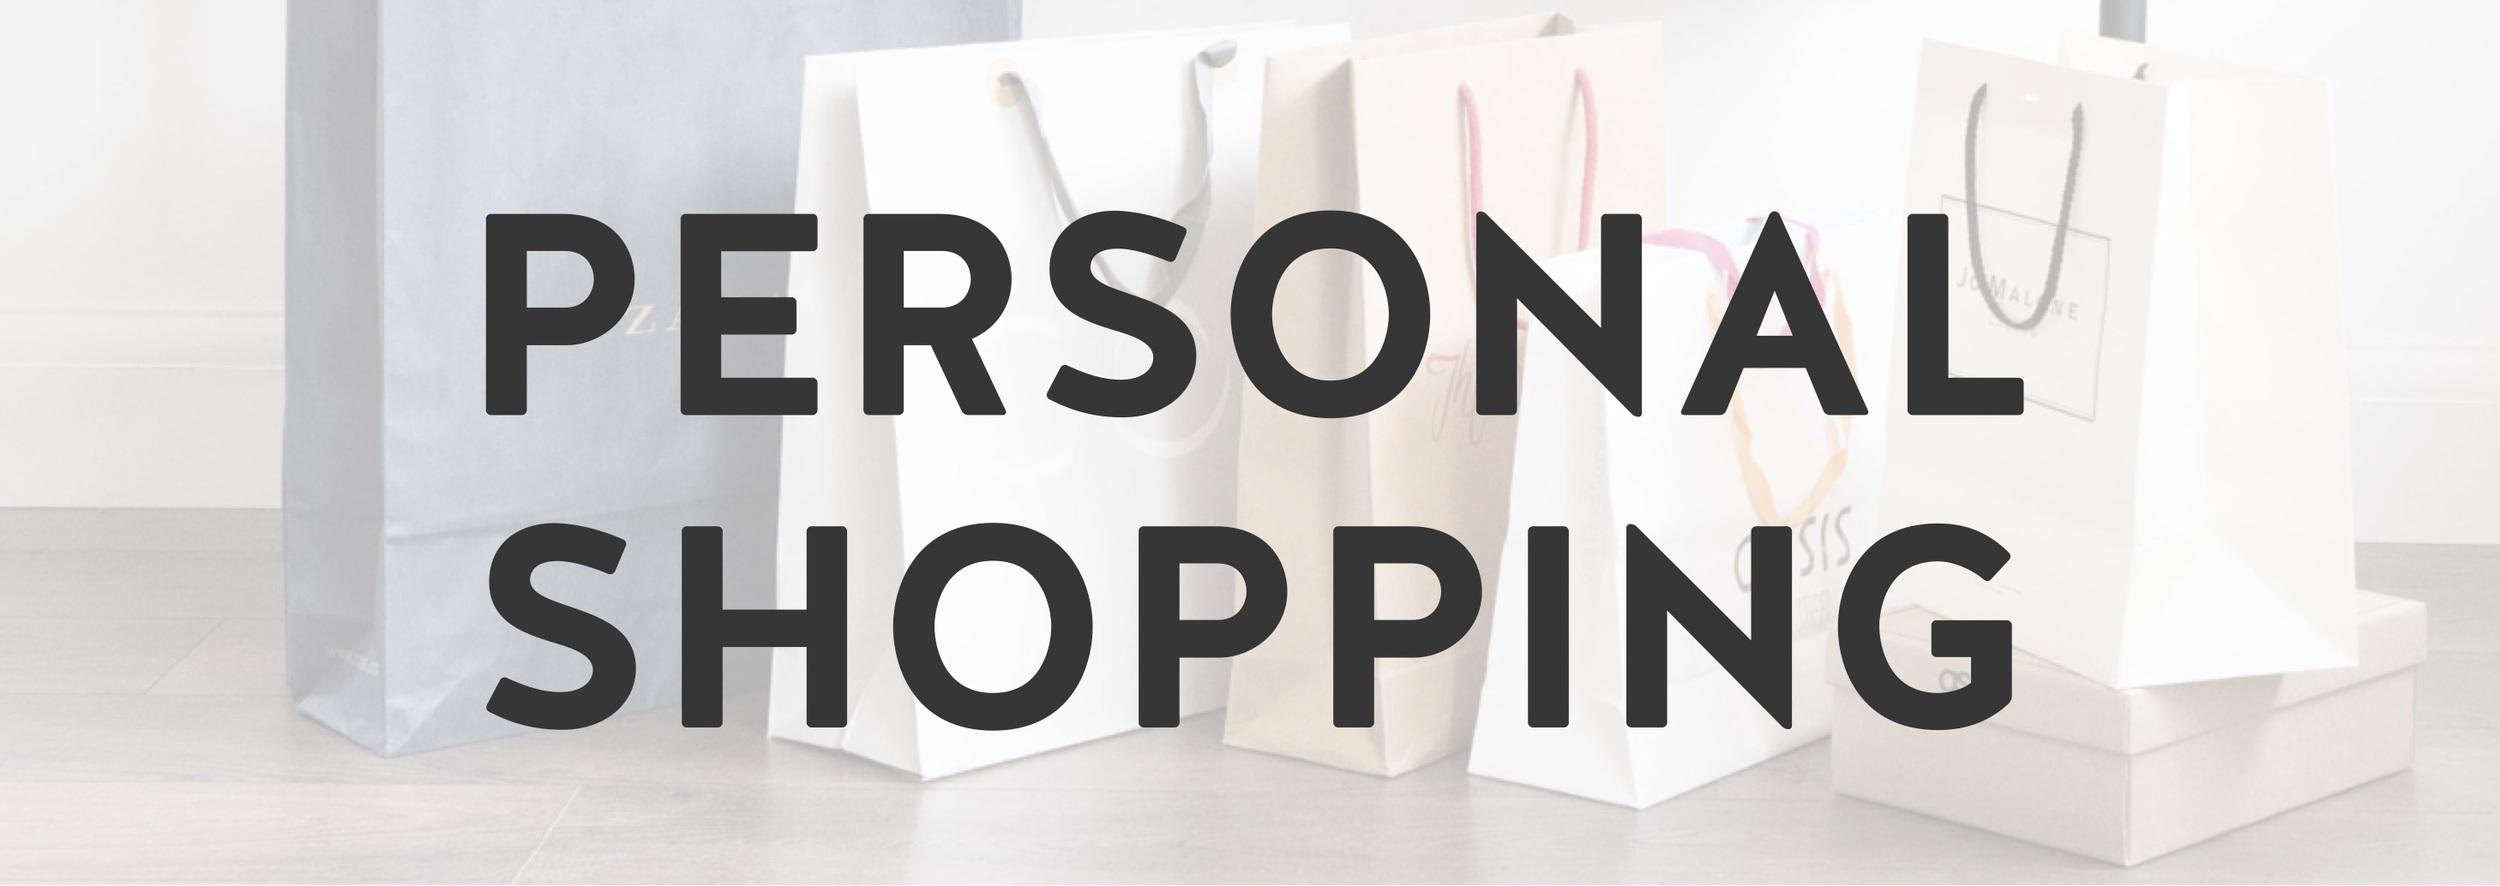 Personal Shopping Hertfordshire, London, Cambridge